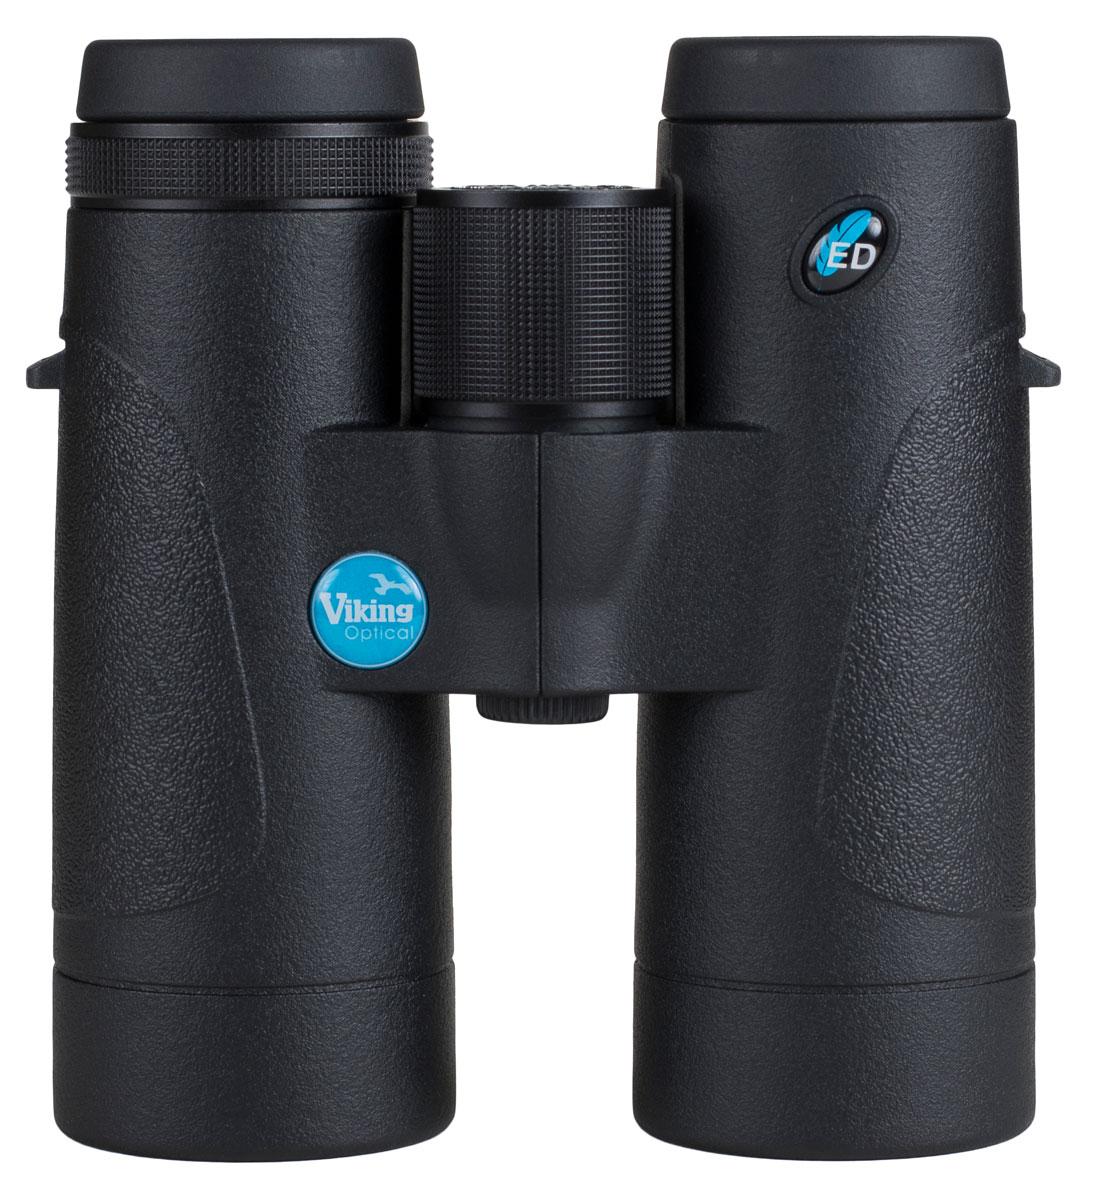 Viking Merlin ED 10x42 Binoculars